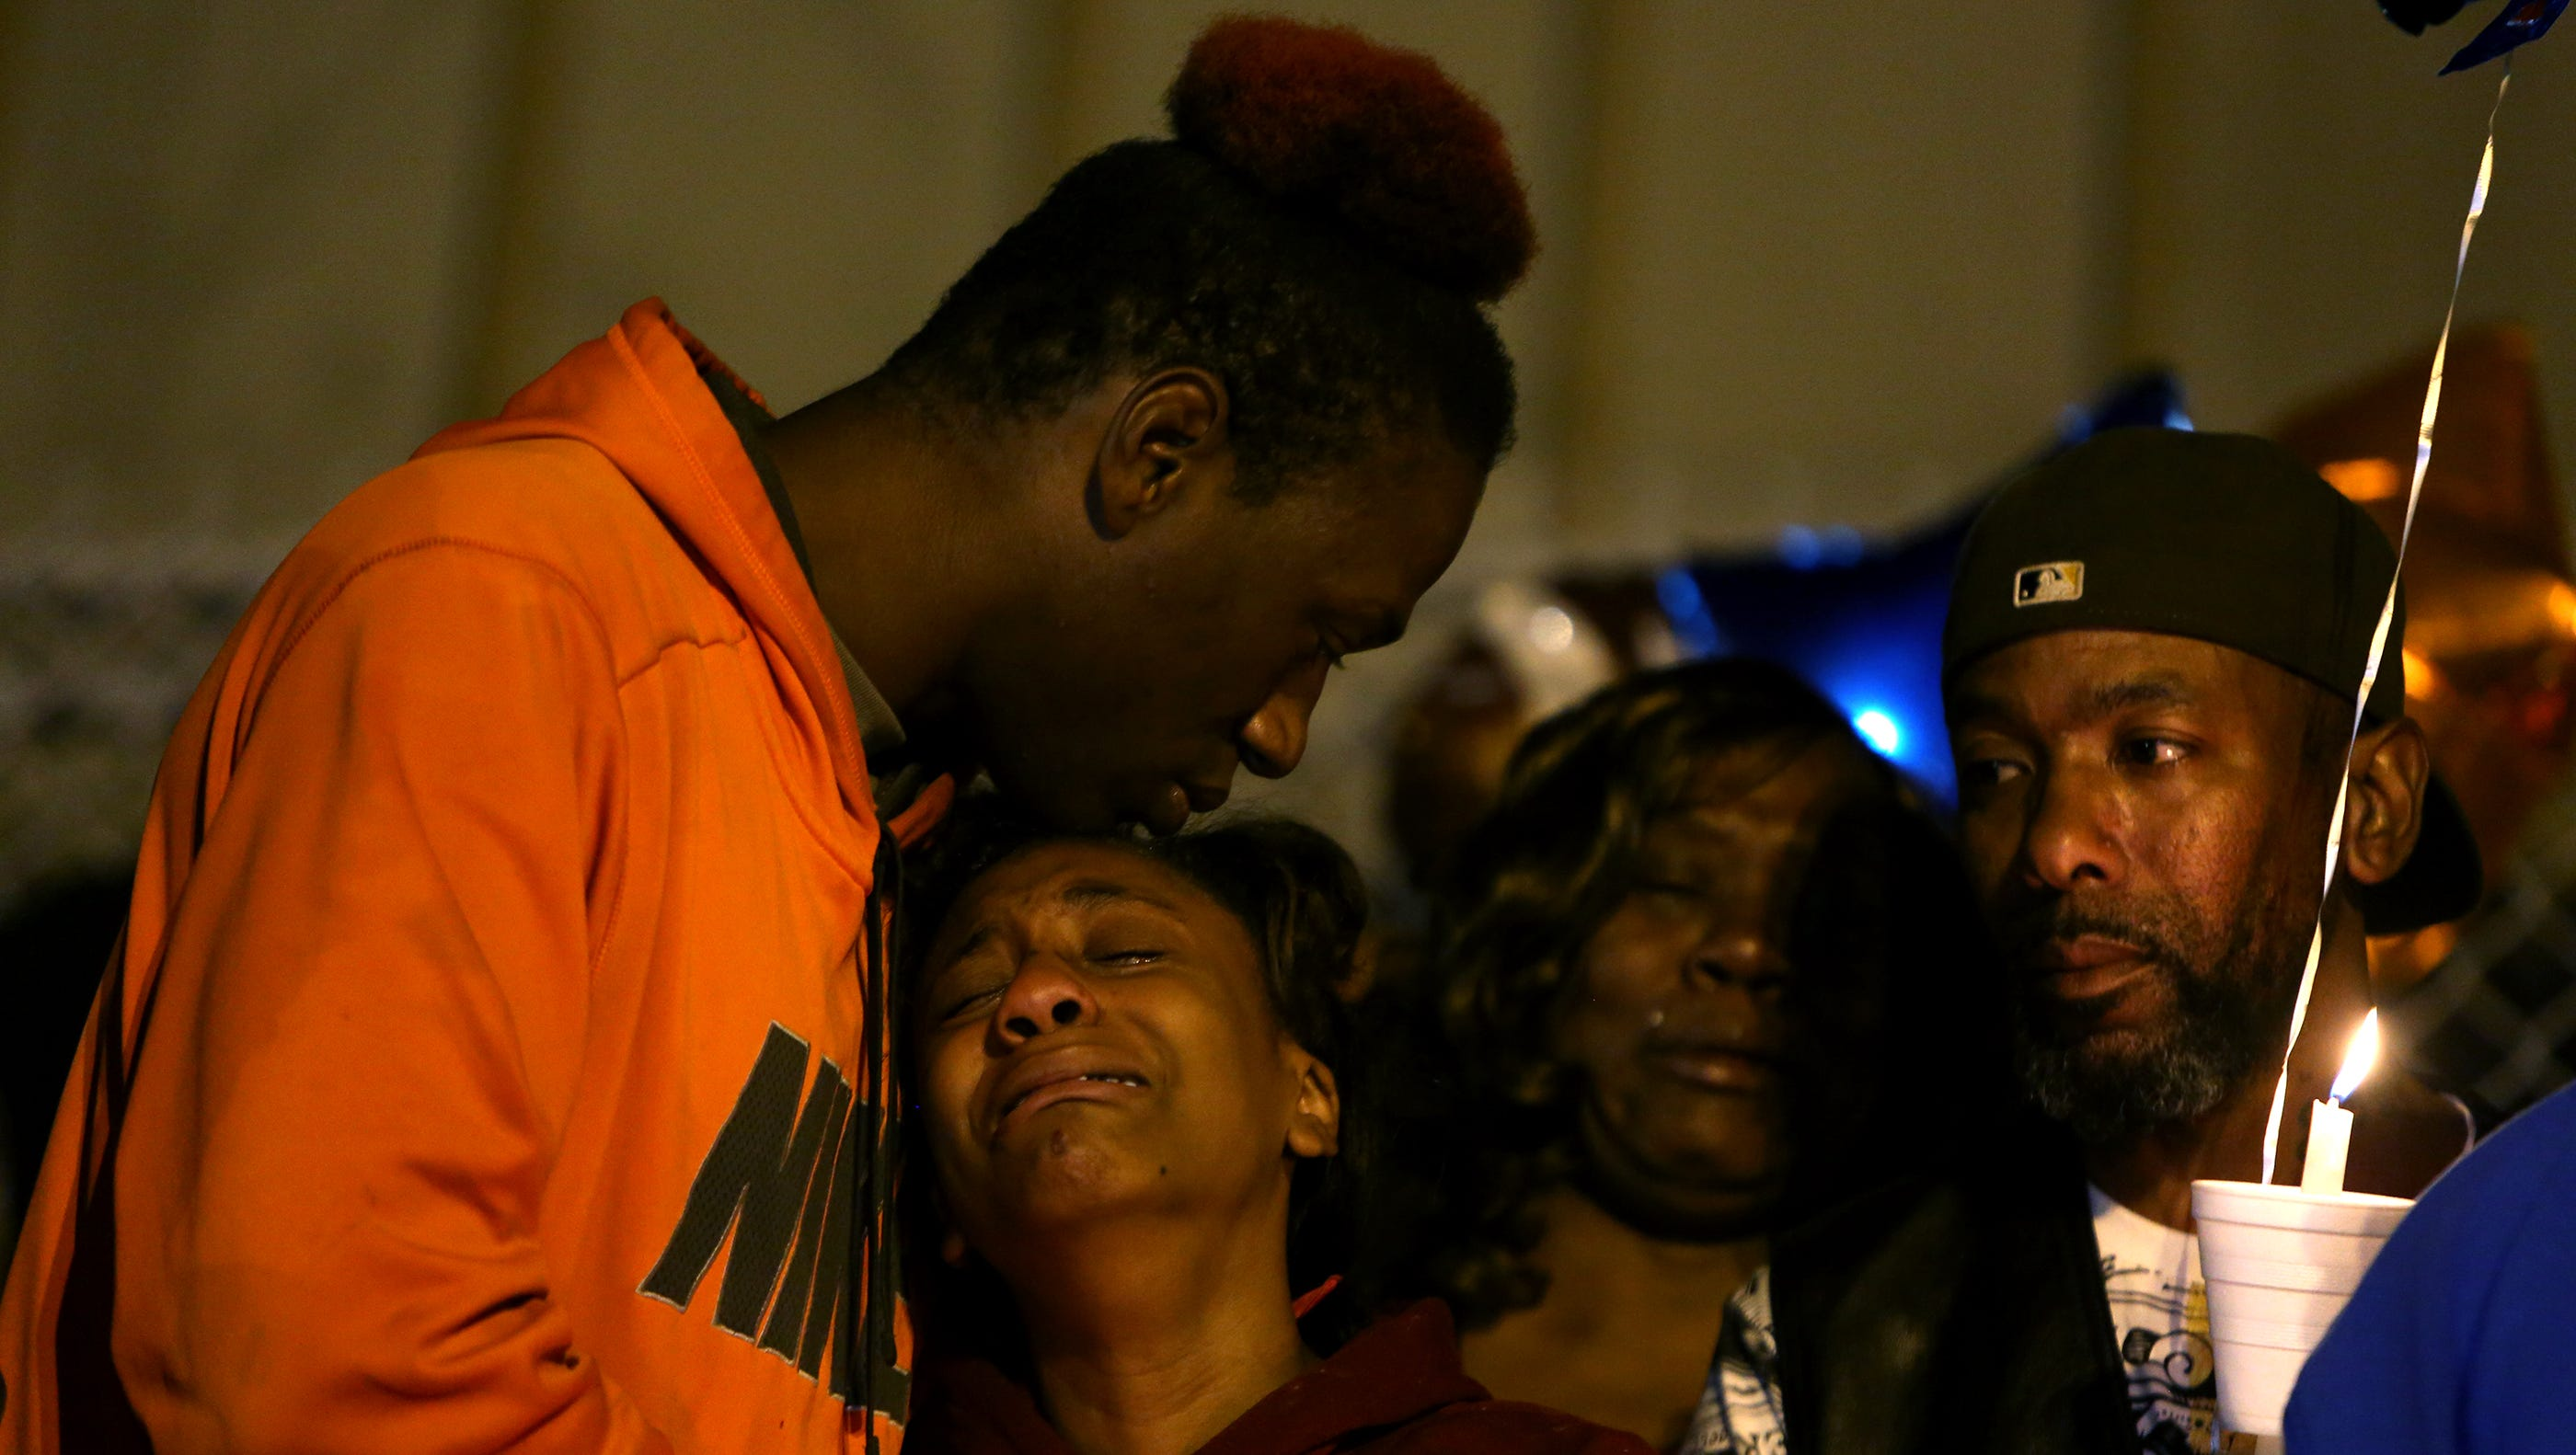 Friends Mourn Loss Of 10 Year Old Richard Jordan Killed In Memphis Shooting